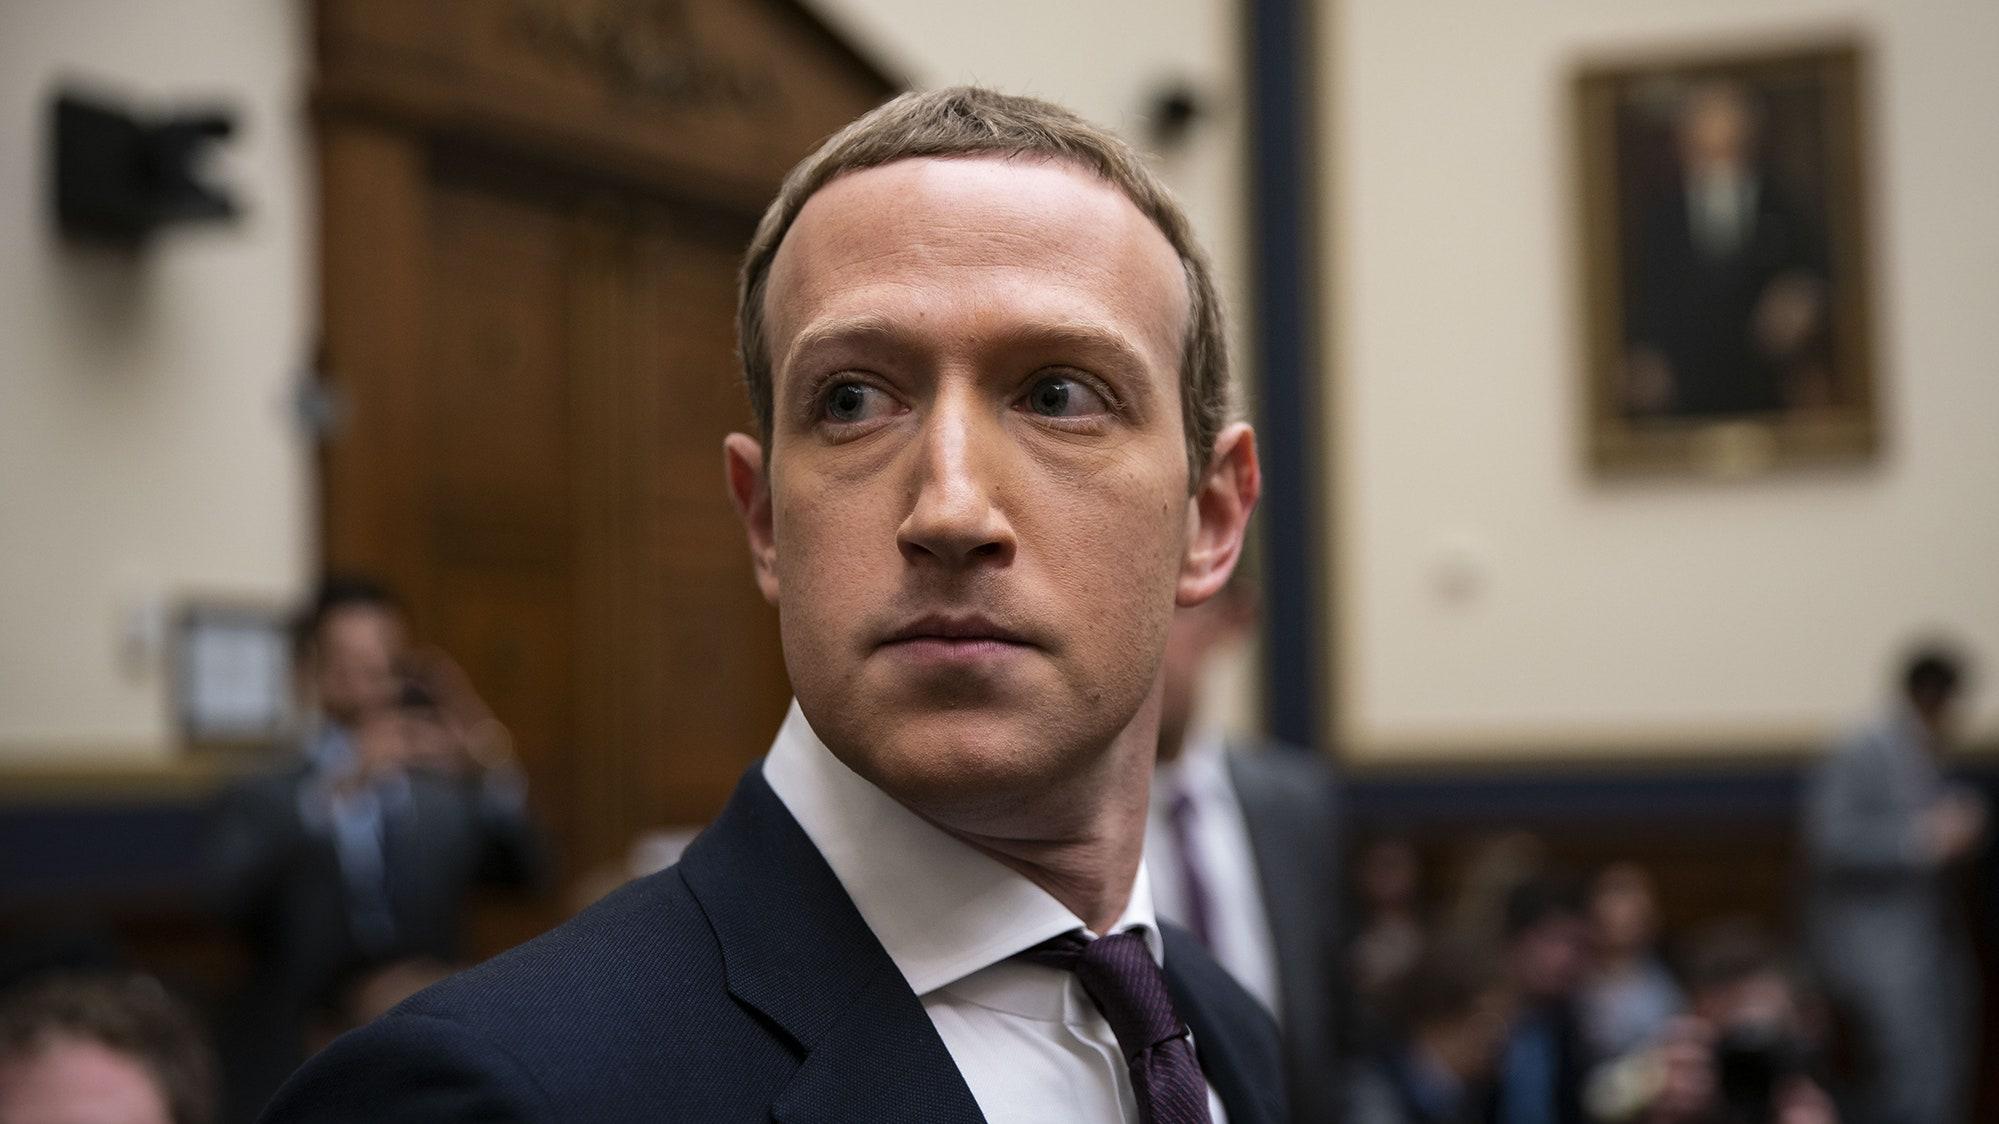 "So You Won't Take Down Lies?"": AOC Blasts Mark Zuckerberg in Testy House  Hearing | Vanity Fair"